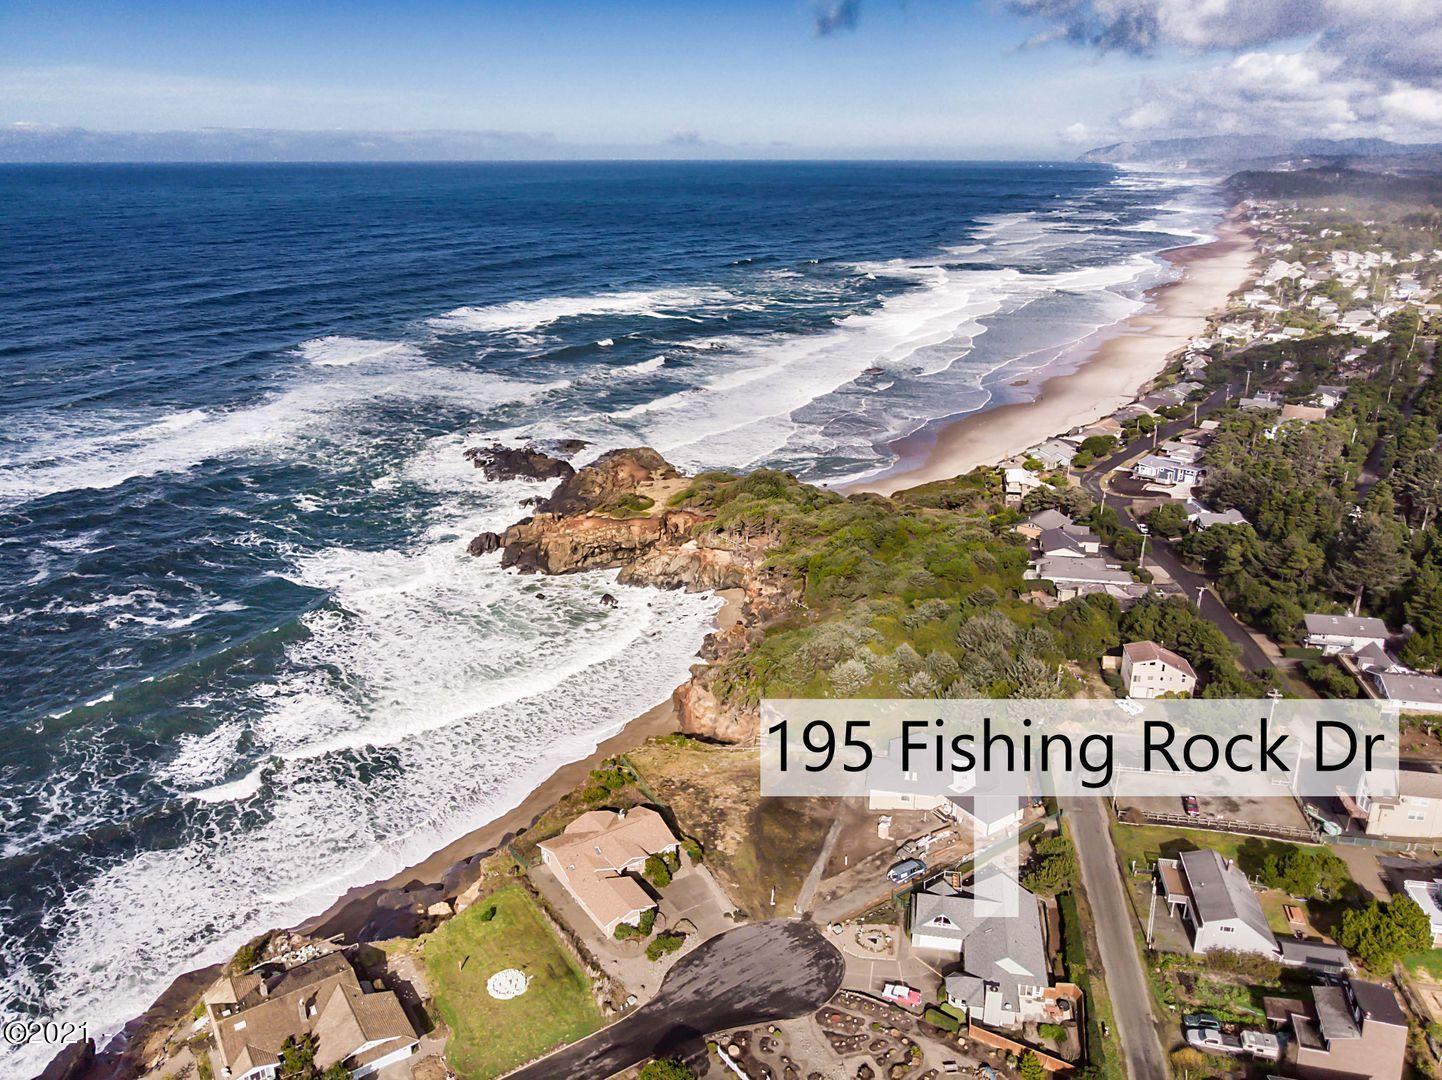 195 Fishing Rock Dr, Depoe Bay, OR 97341